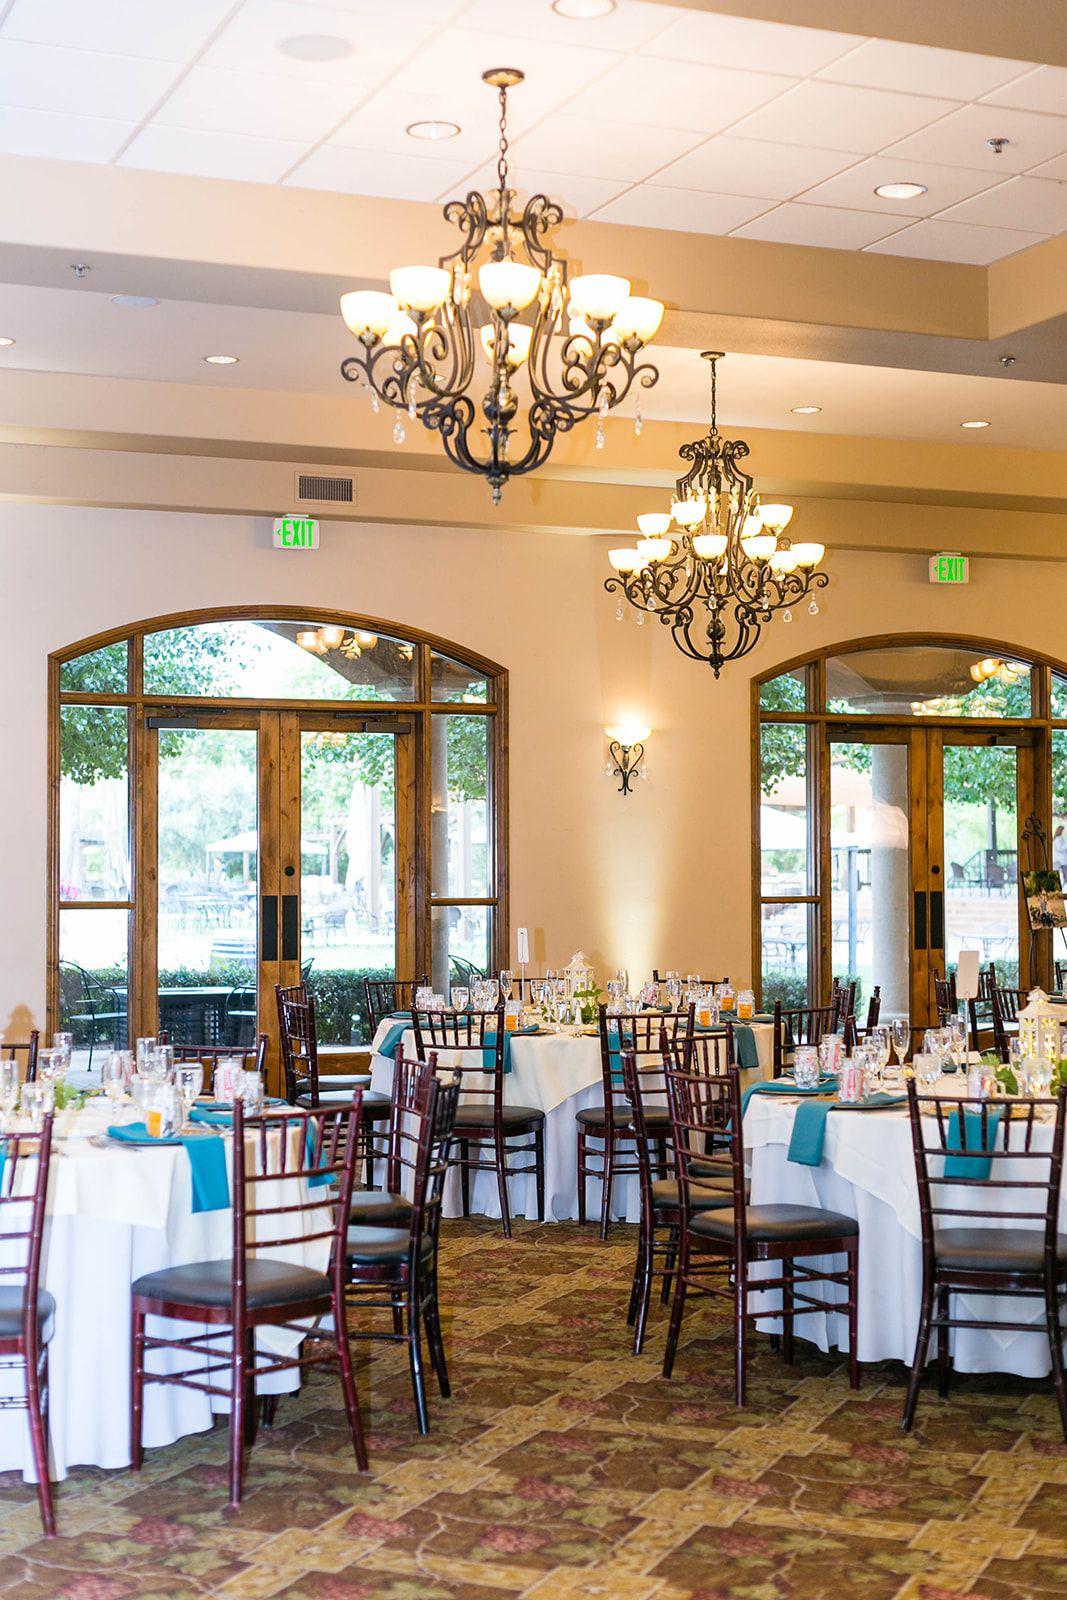 Reception Area Wilson Creek Winery Wedding Venue In Temecula Ca Leah Marie Photography Winery Wedding Venue California Wedding Venues Temecula Weddings